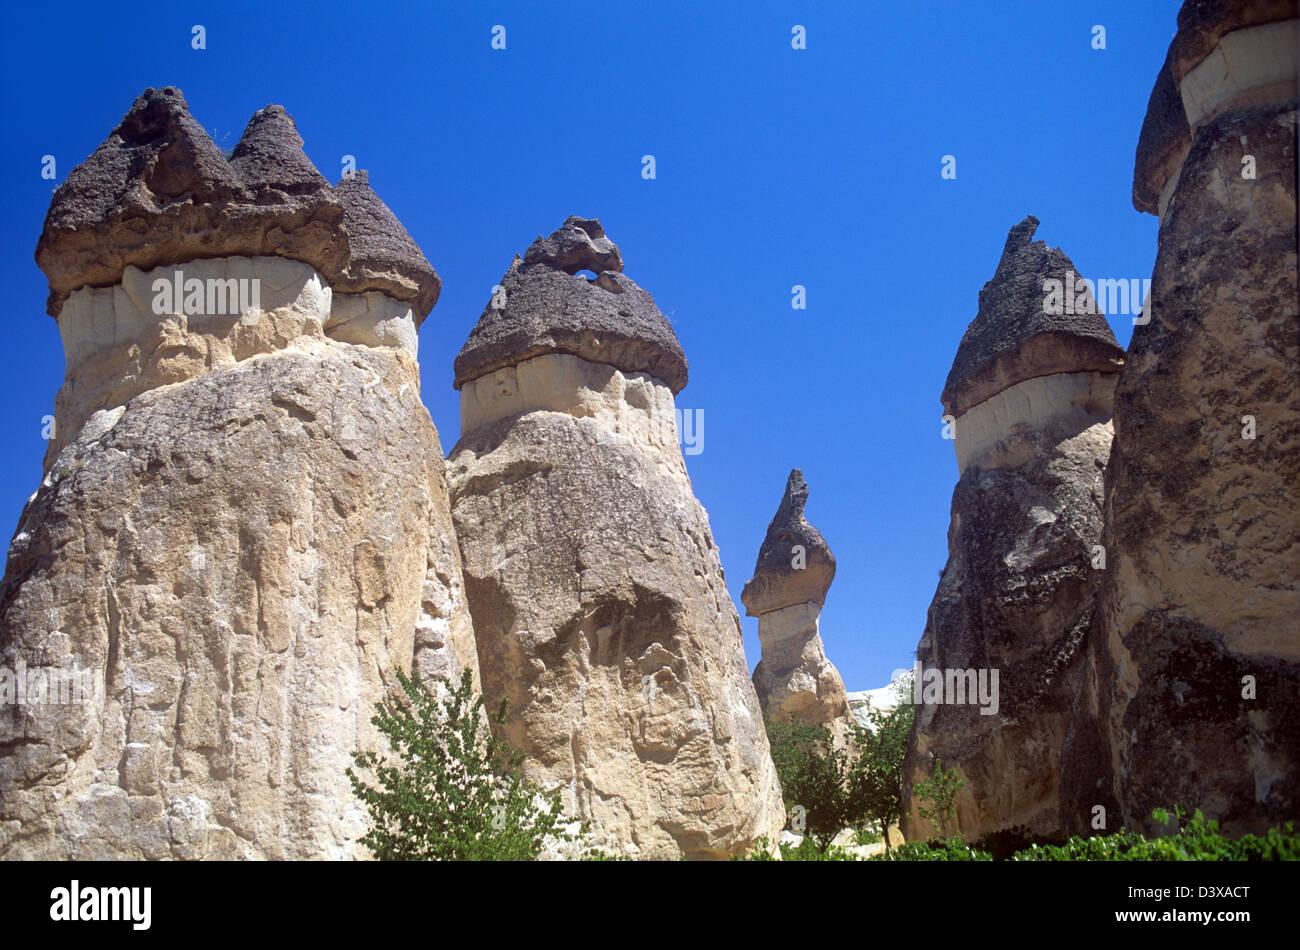 Pierre naturelle inhabituelle en formations de Cappadoce, Turquie Photo Stock